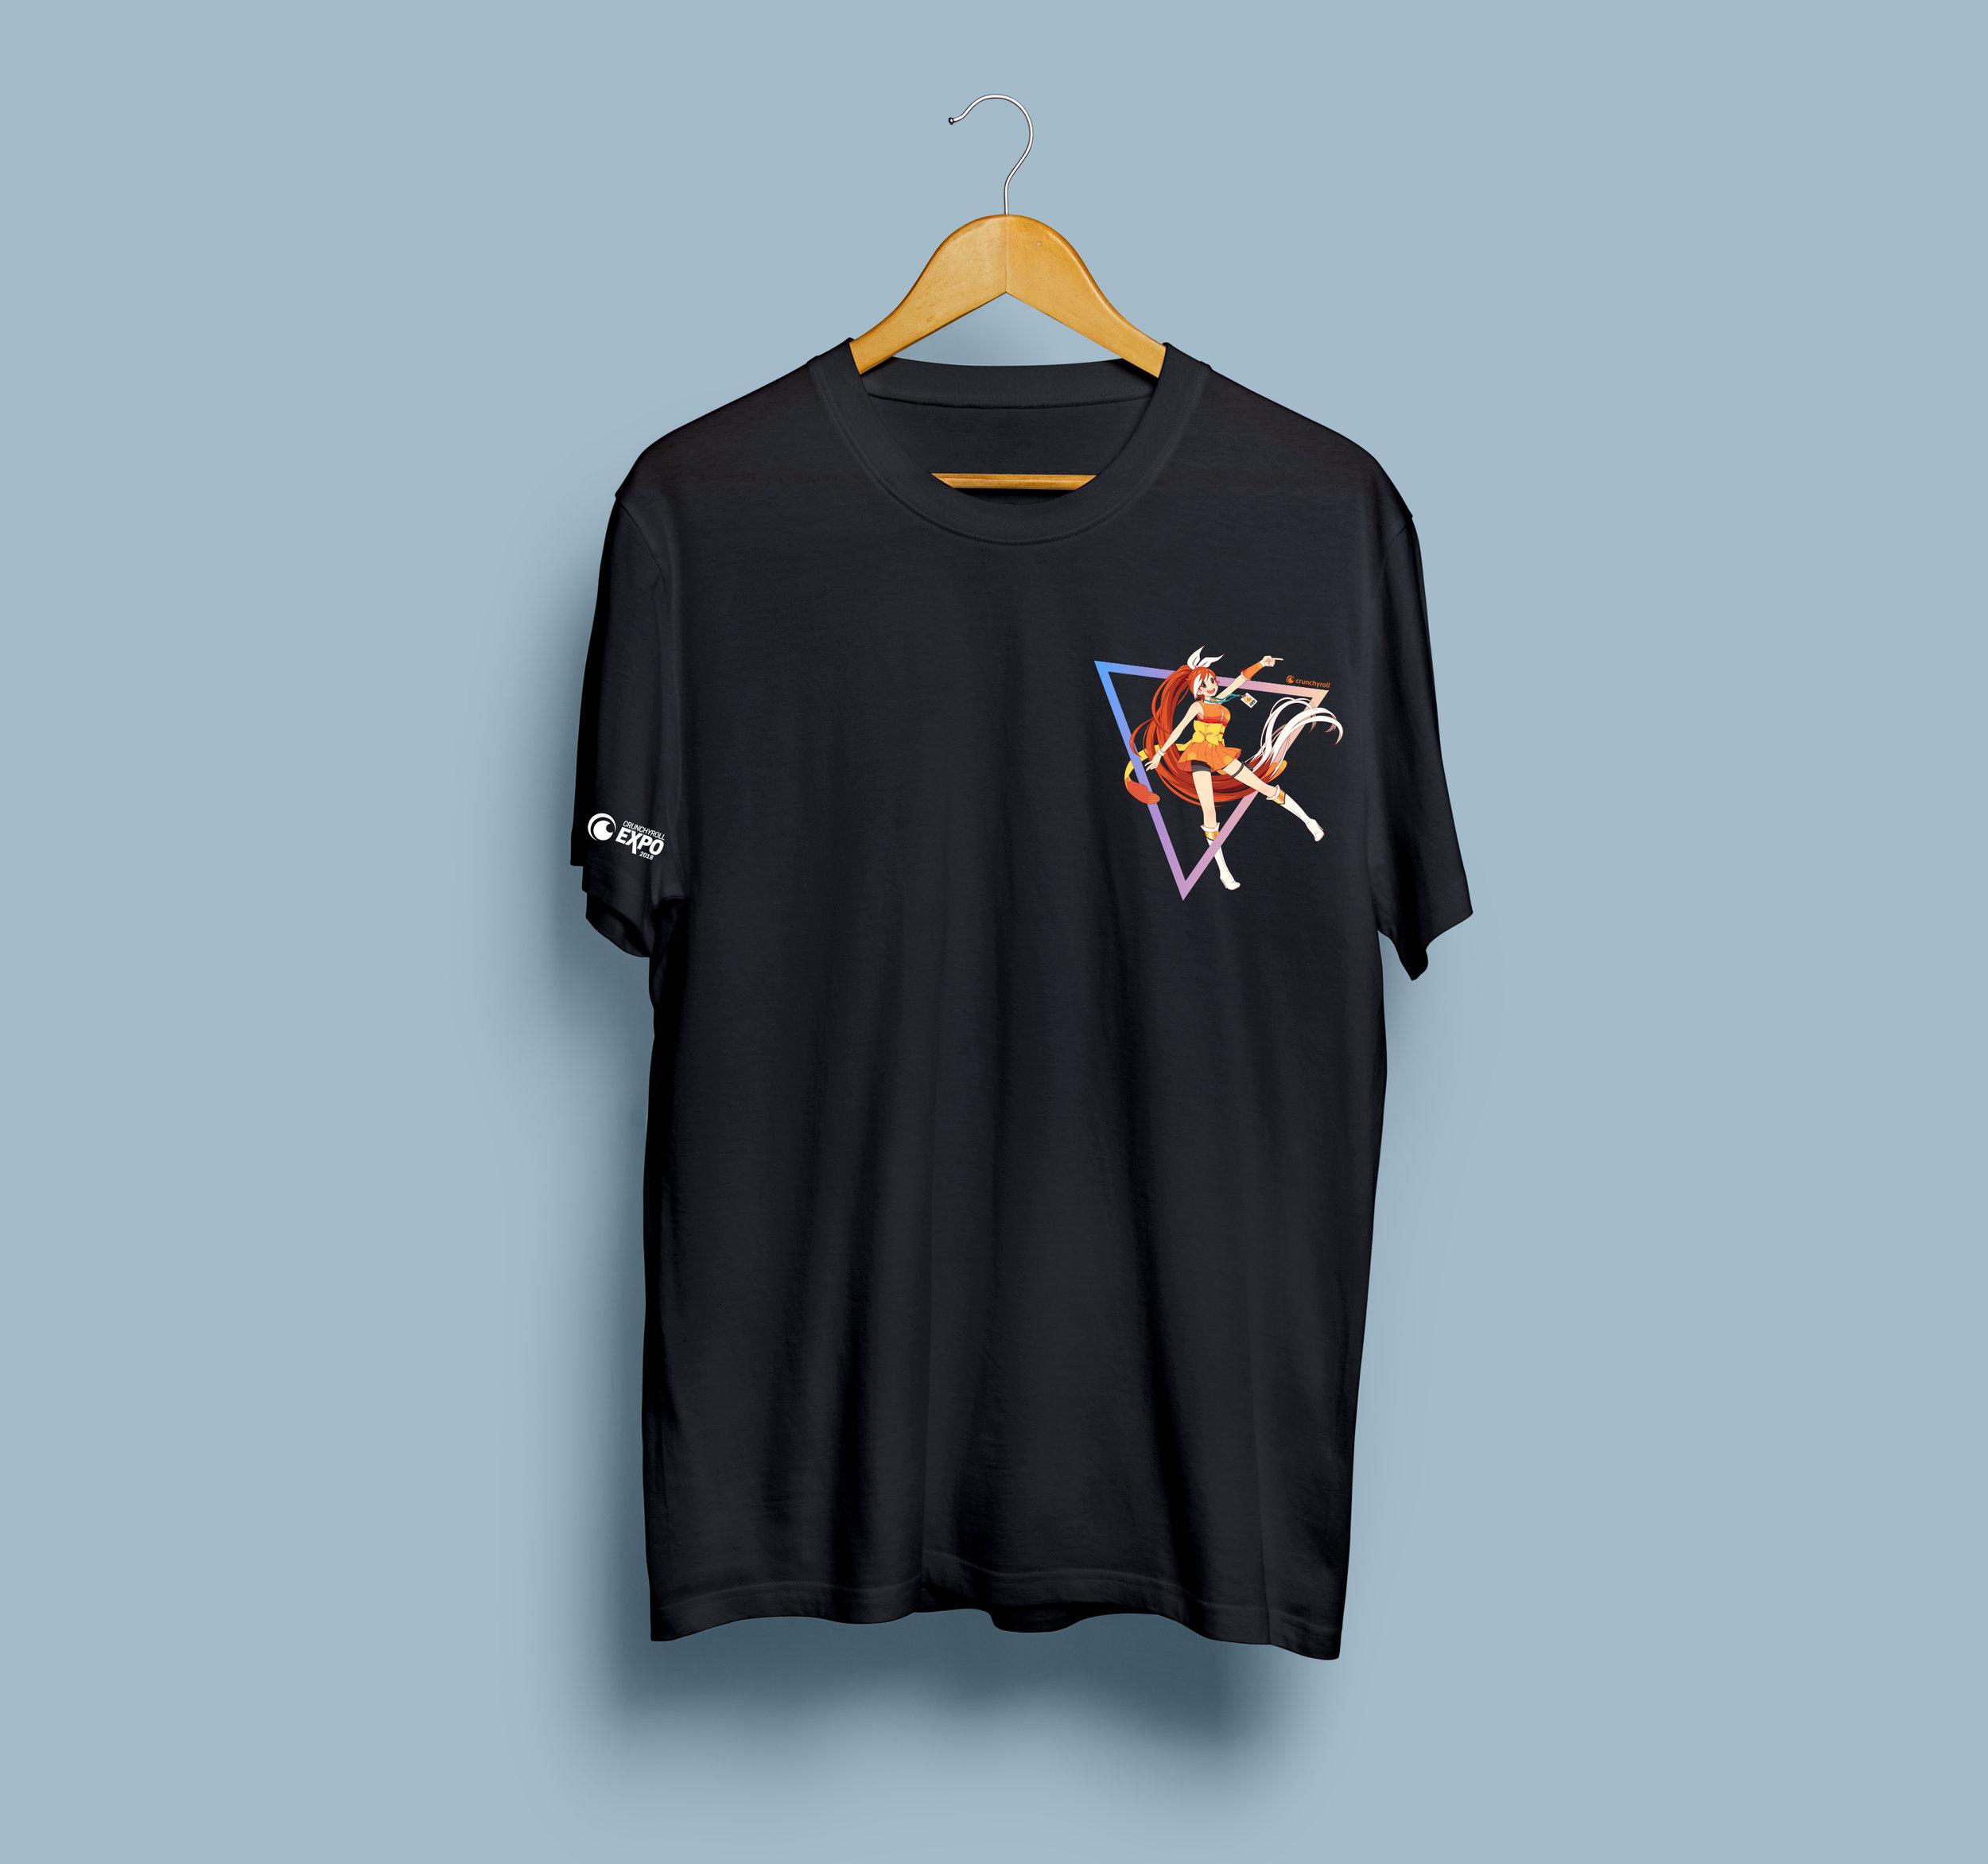 T-ShirtMock-UpFront_Small Triangle.jpg